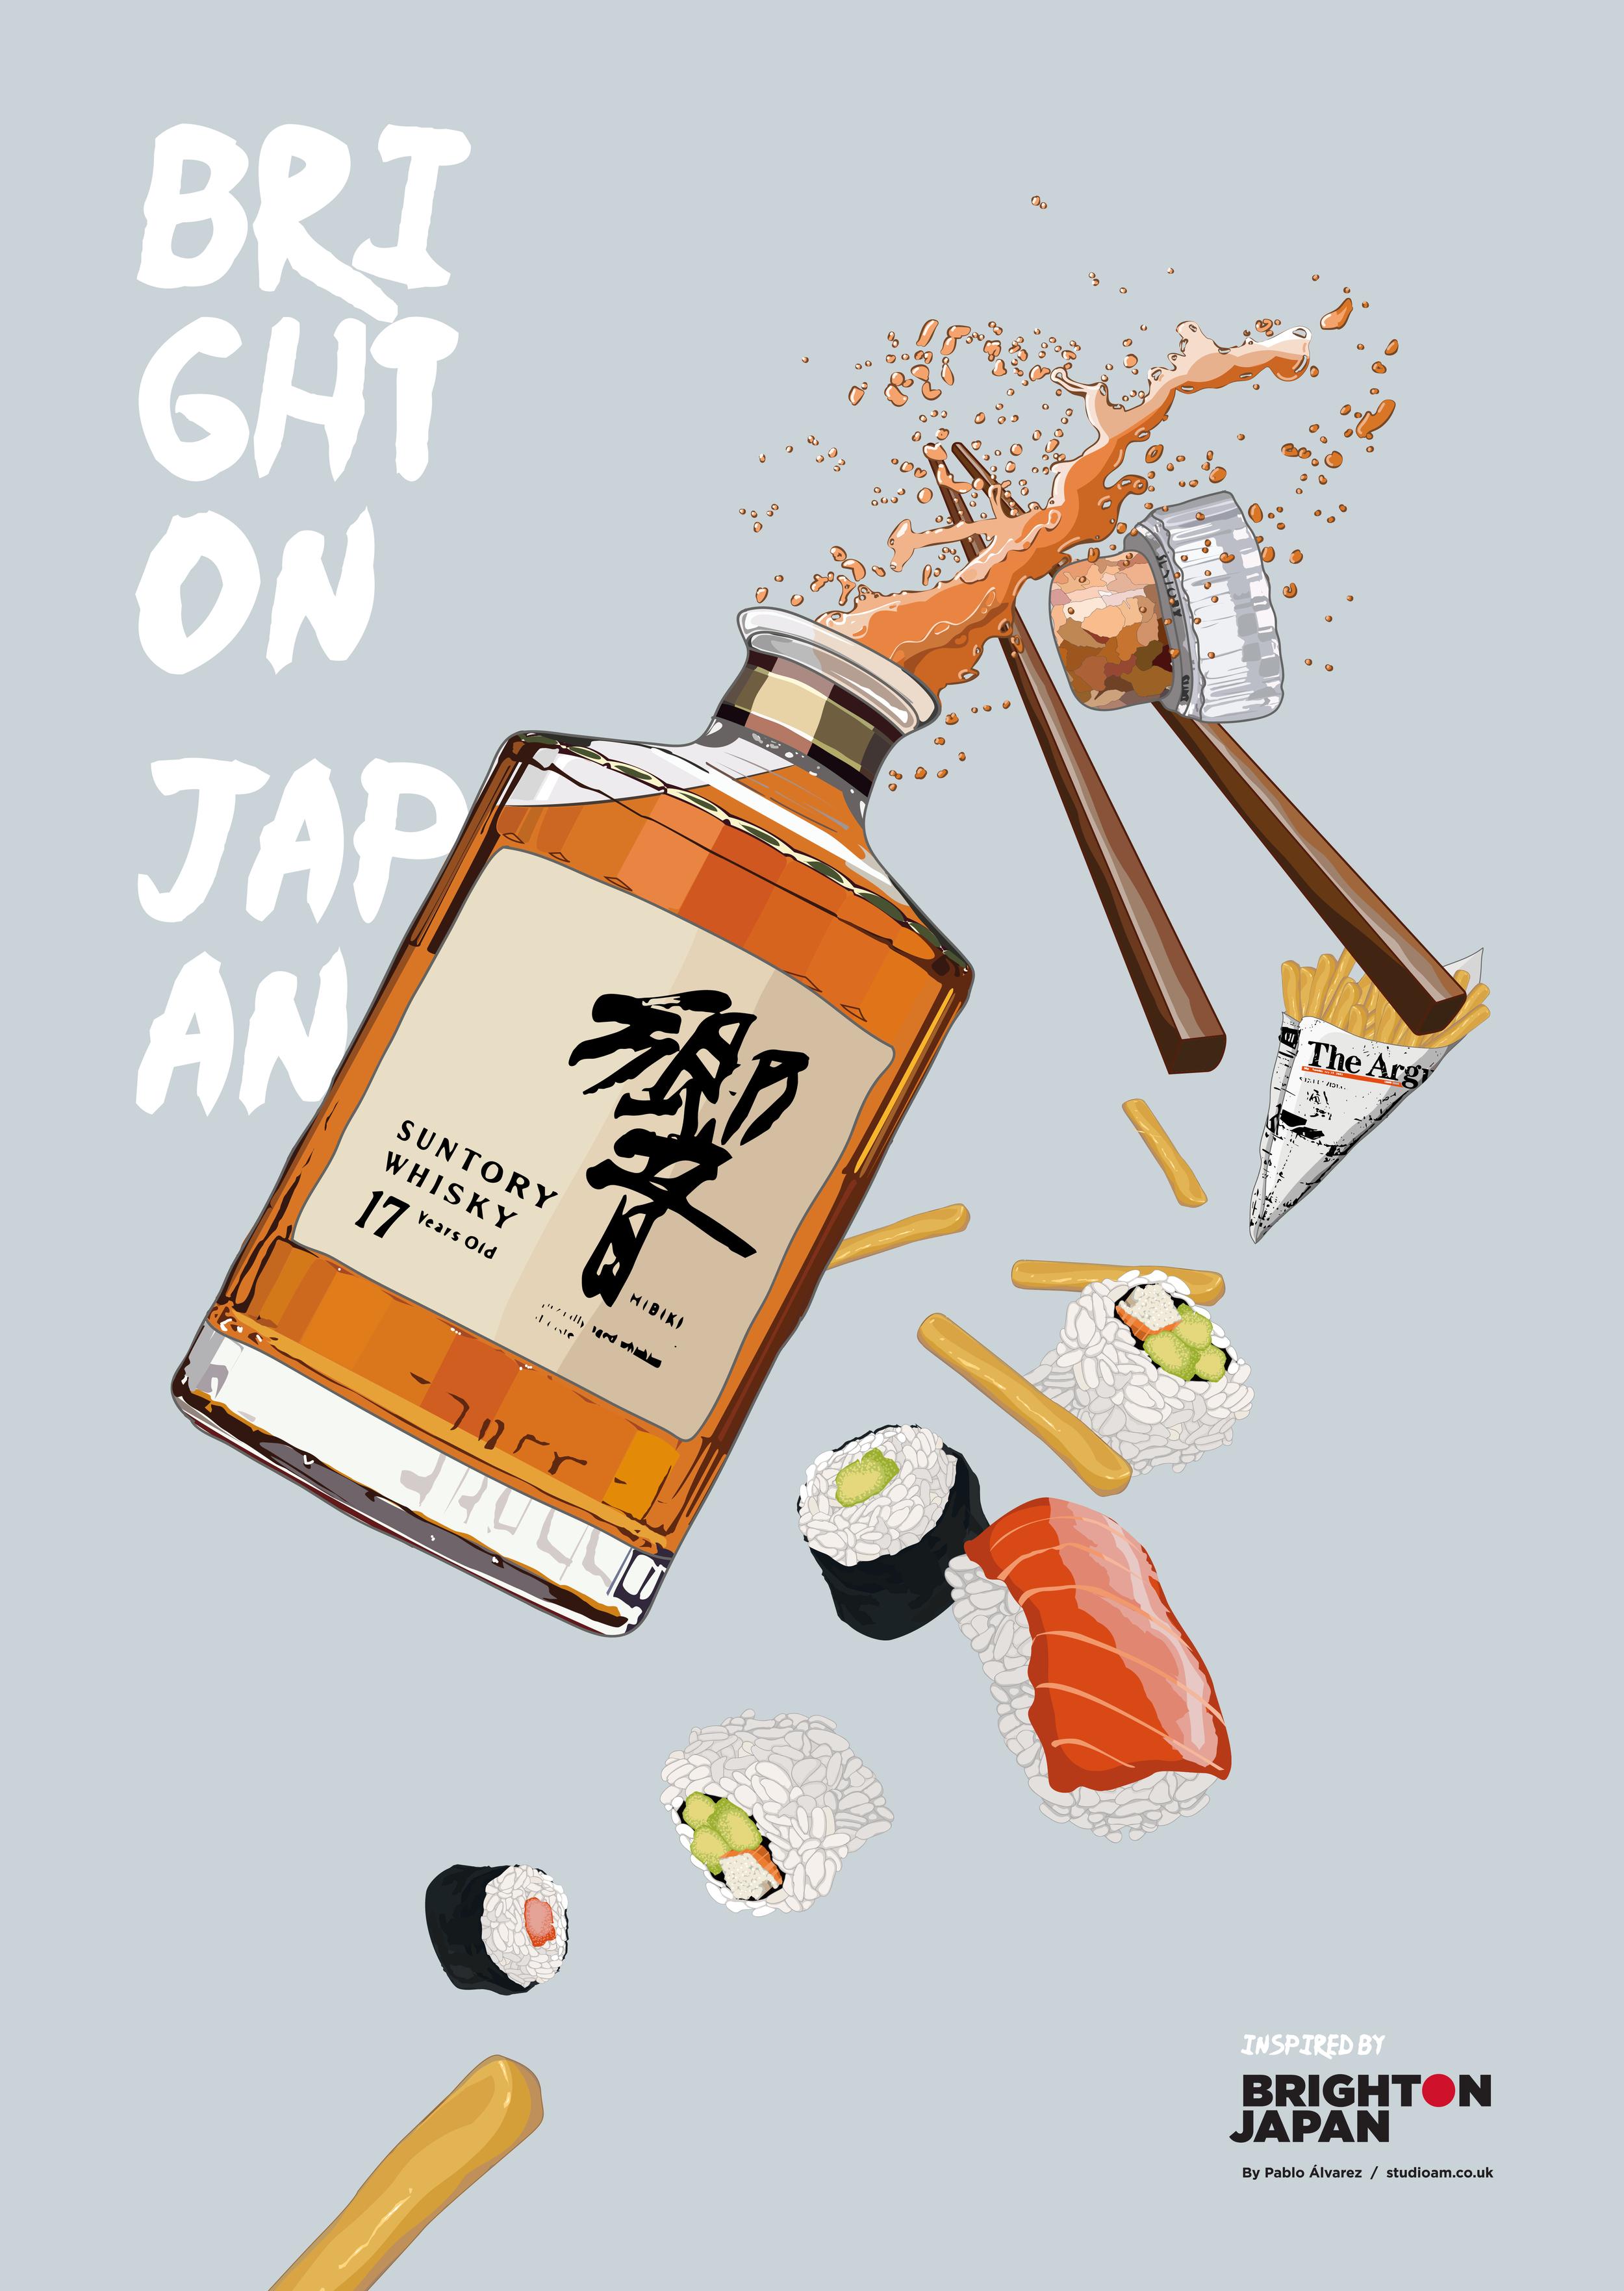 Brighton_Japan_poster-01.jpg